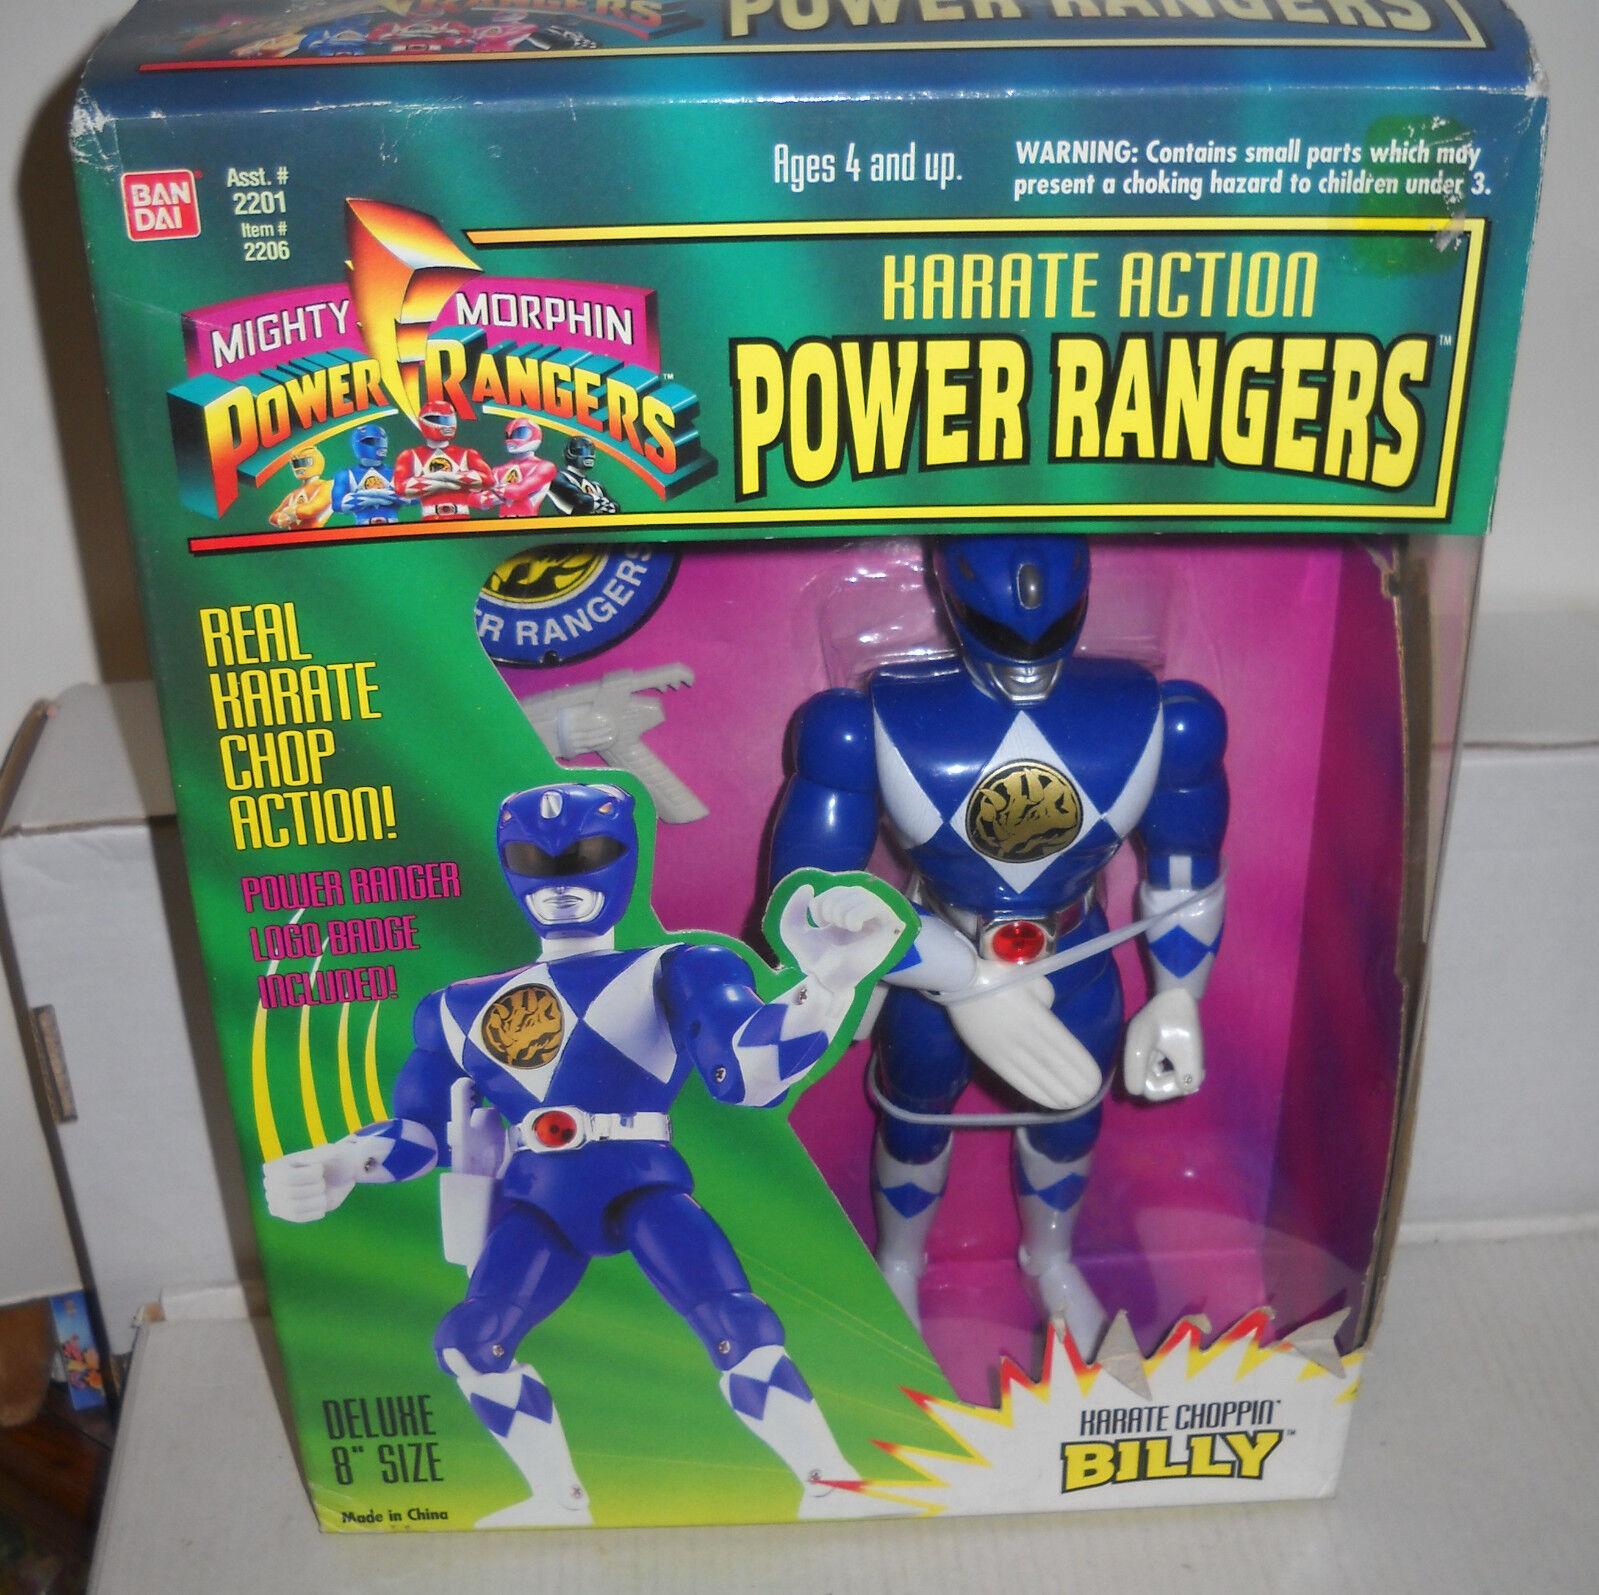 7760 nrfb verbot dai mächtige morphin power rangers karate aktion blaue ranger billy